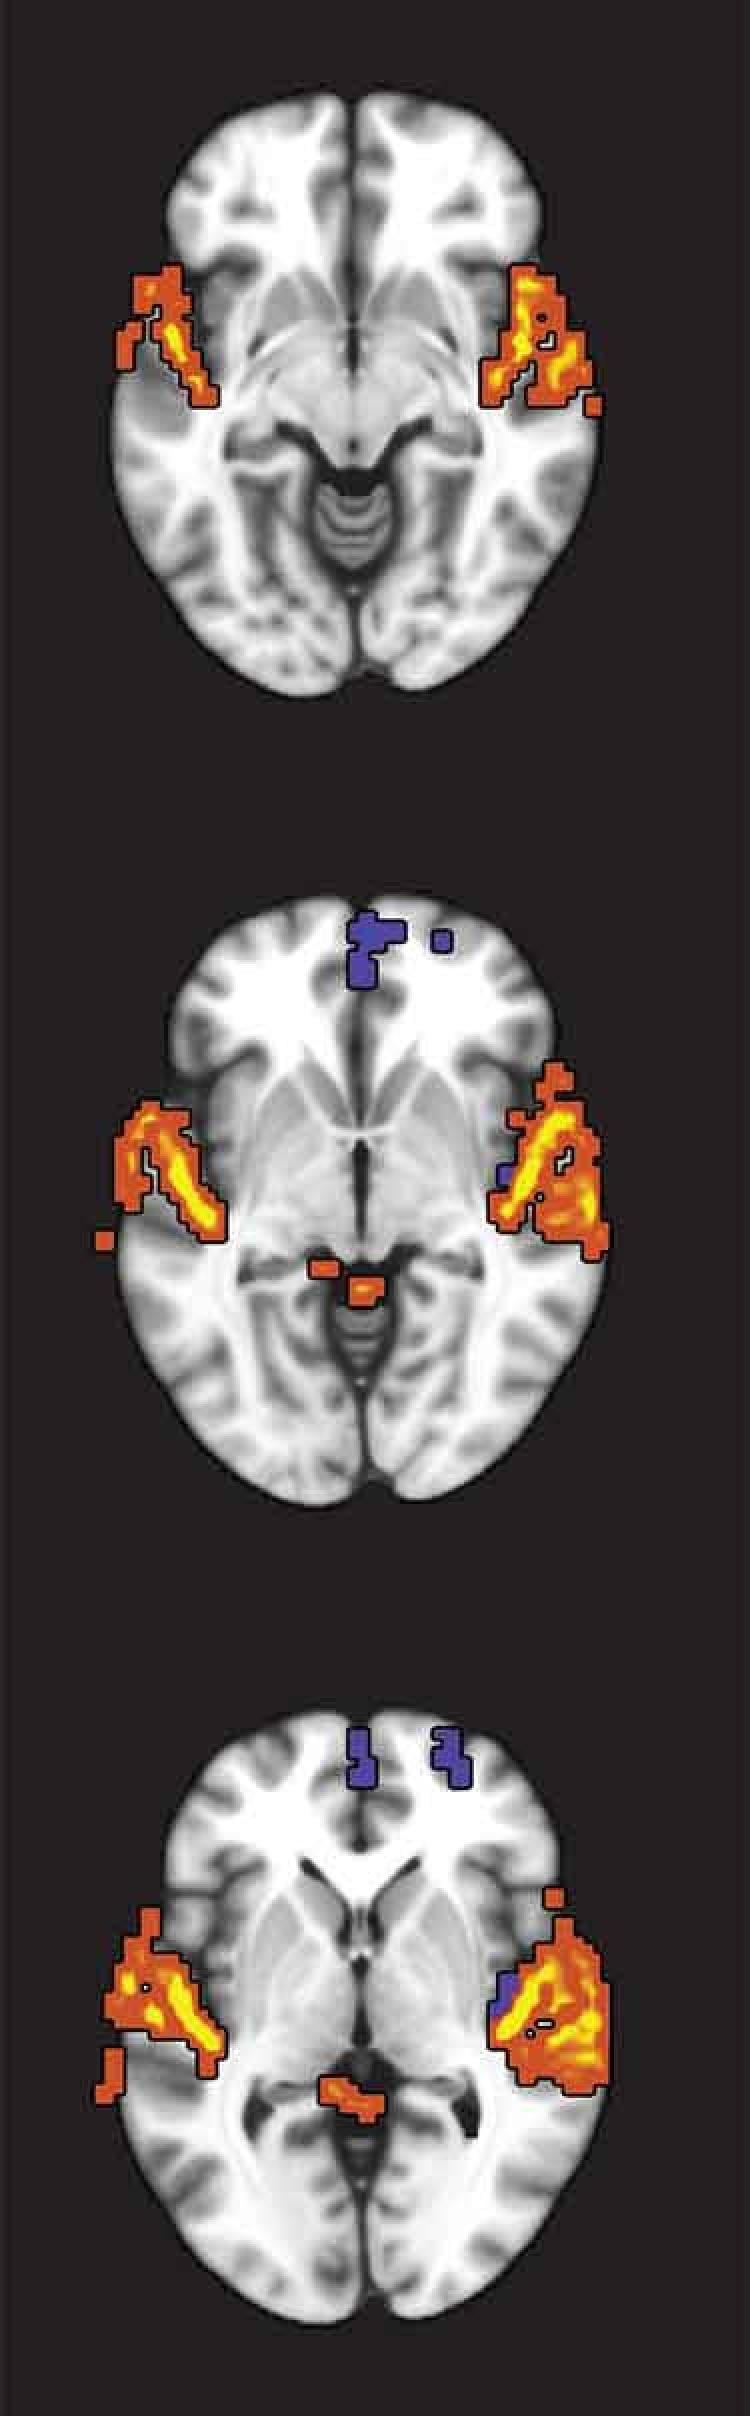 three brain images